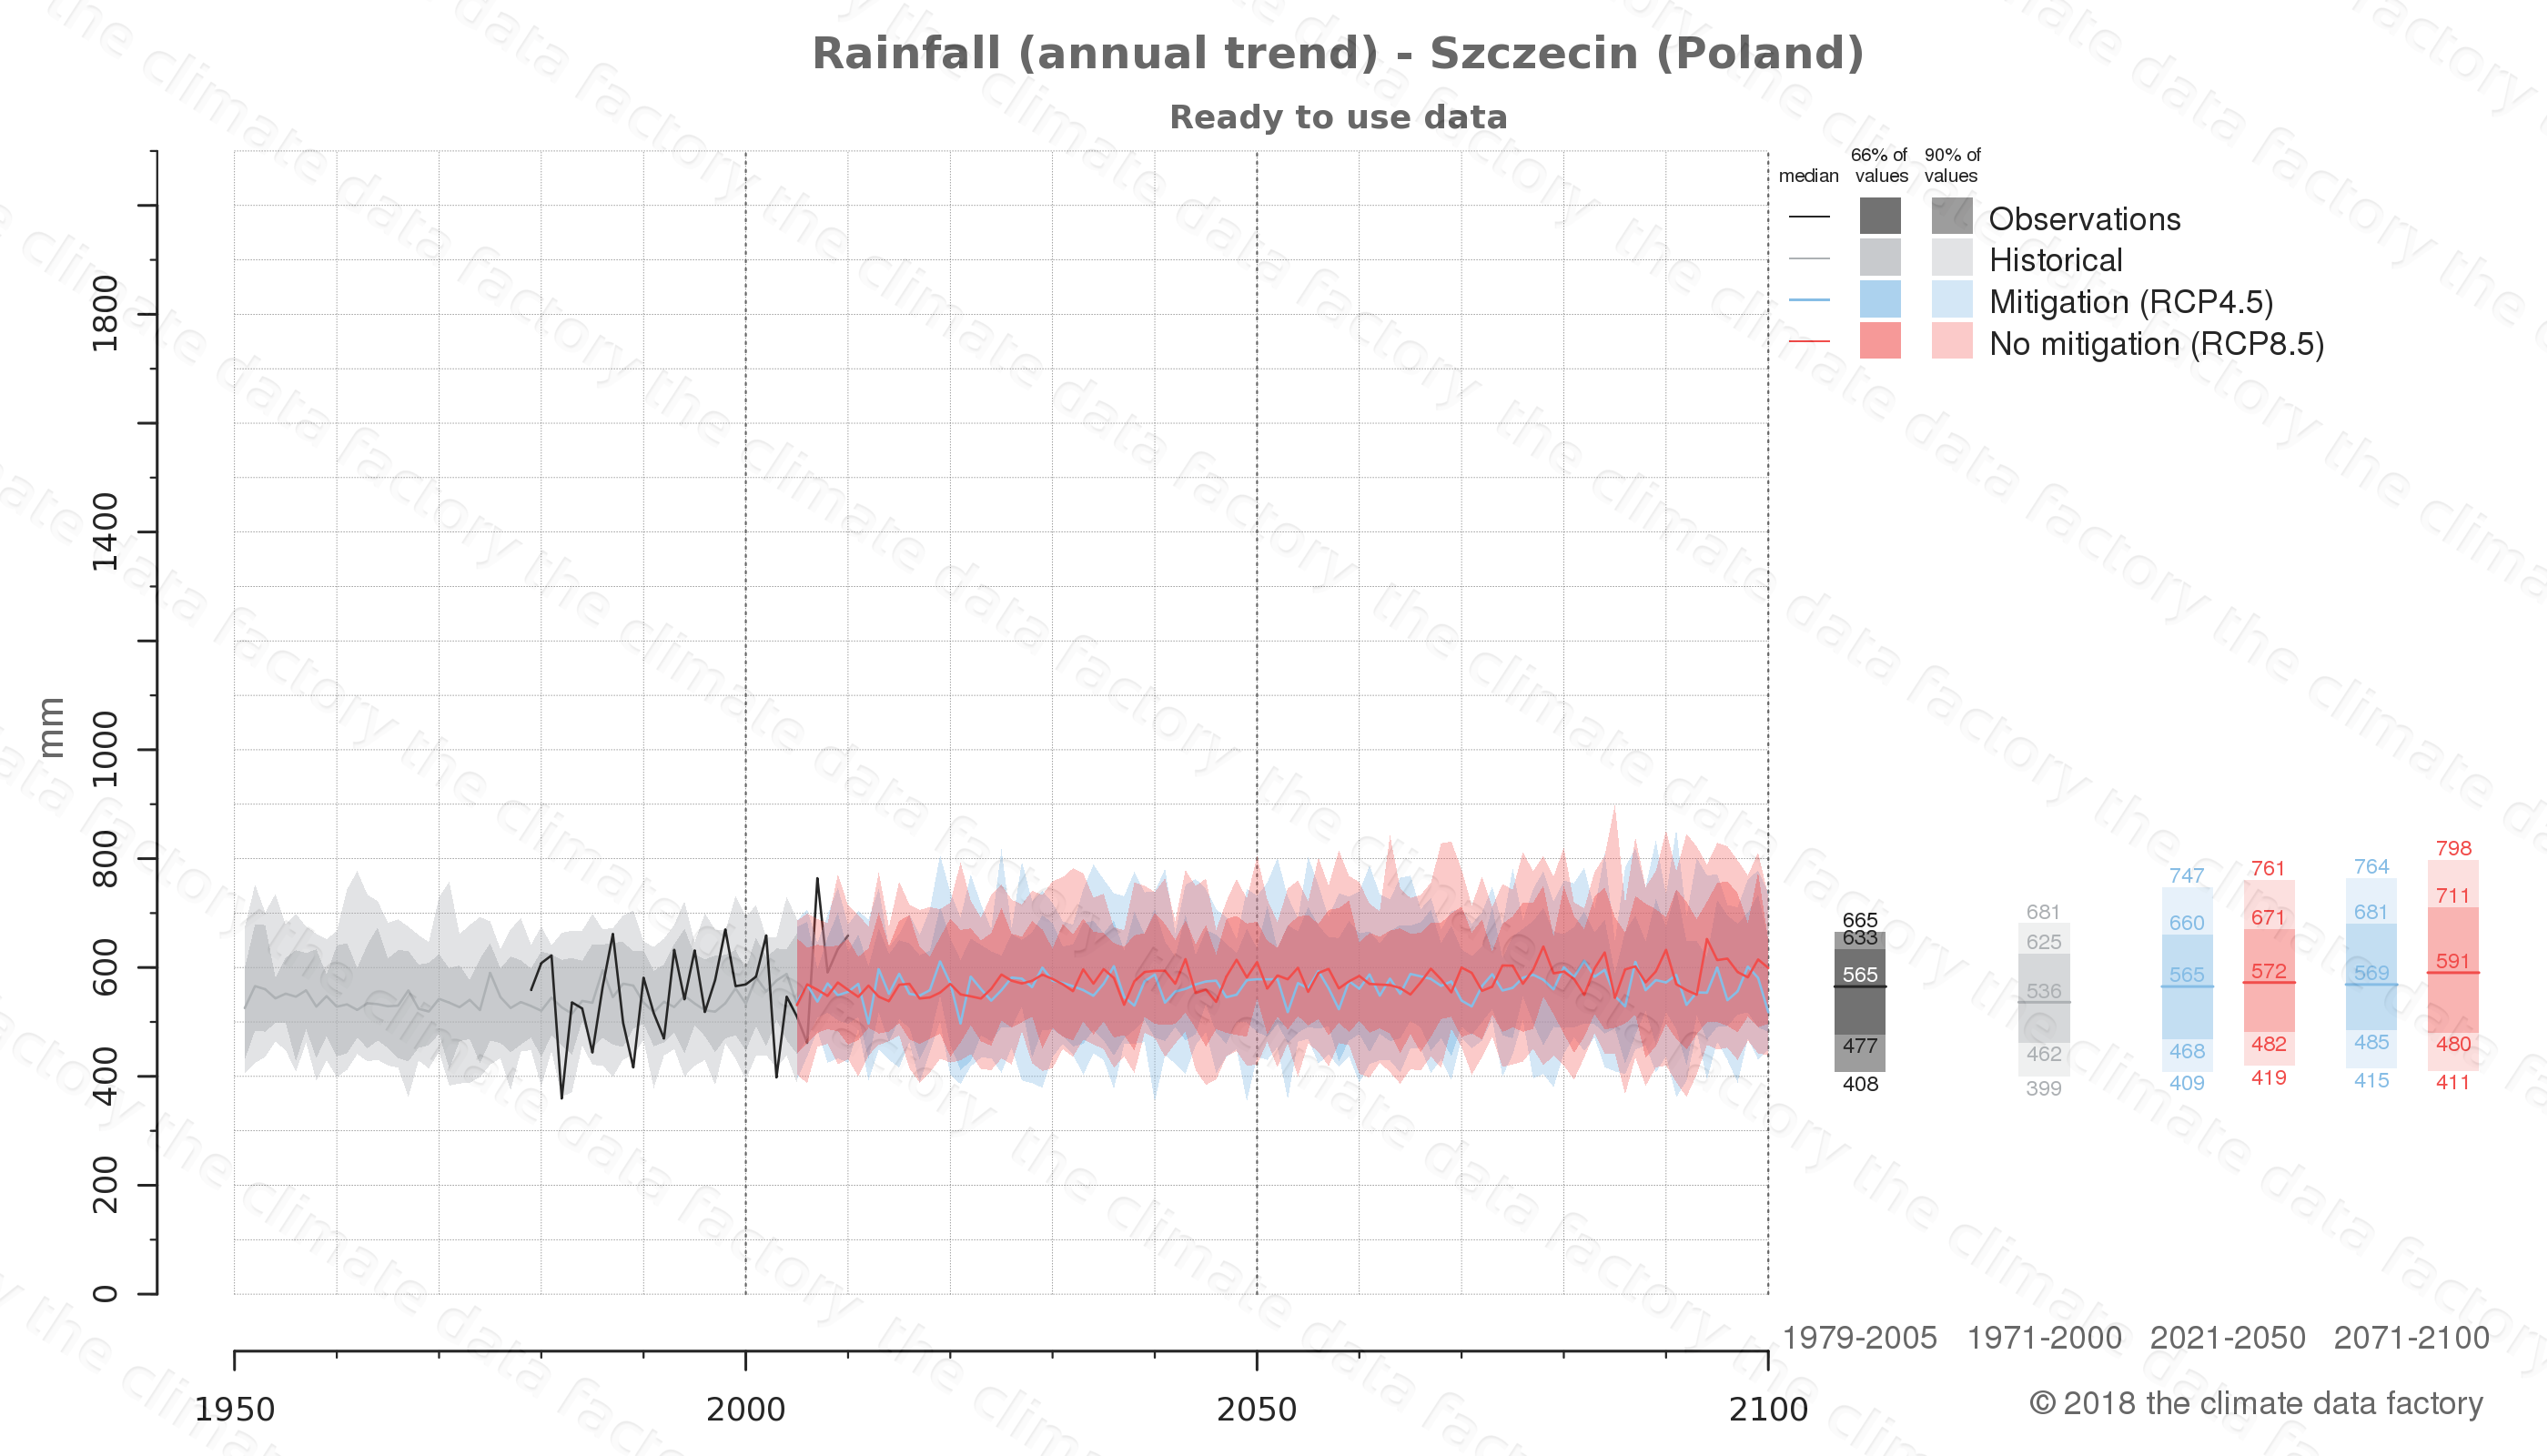 climate change data policy adaptation climate graph city data rainfall szczecin poland